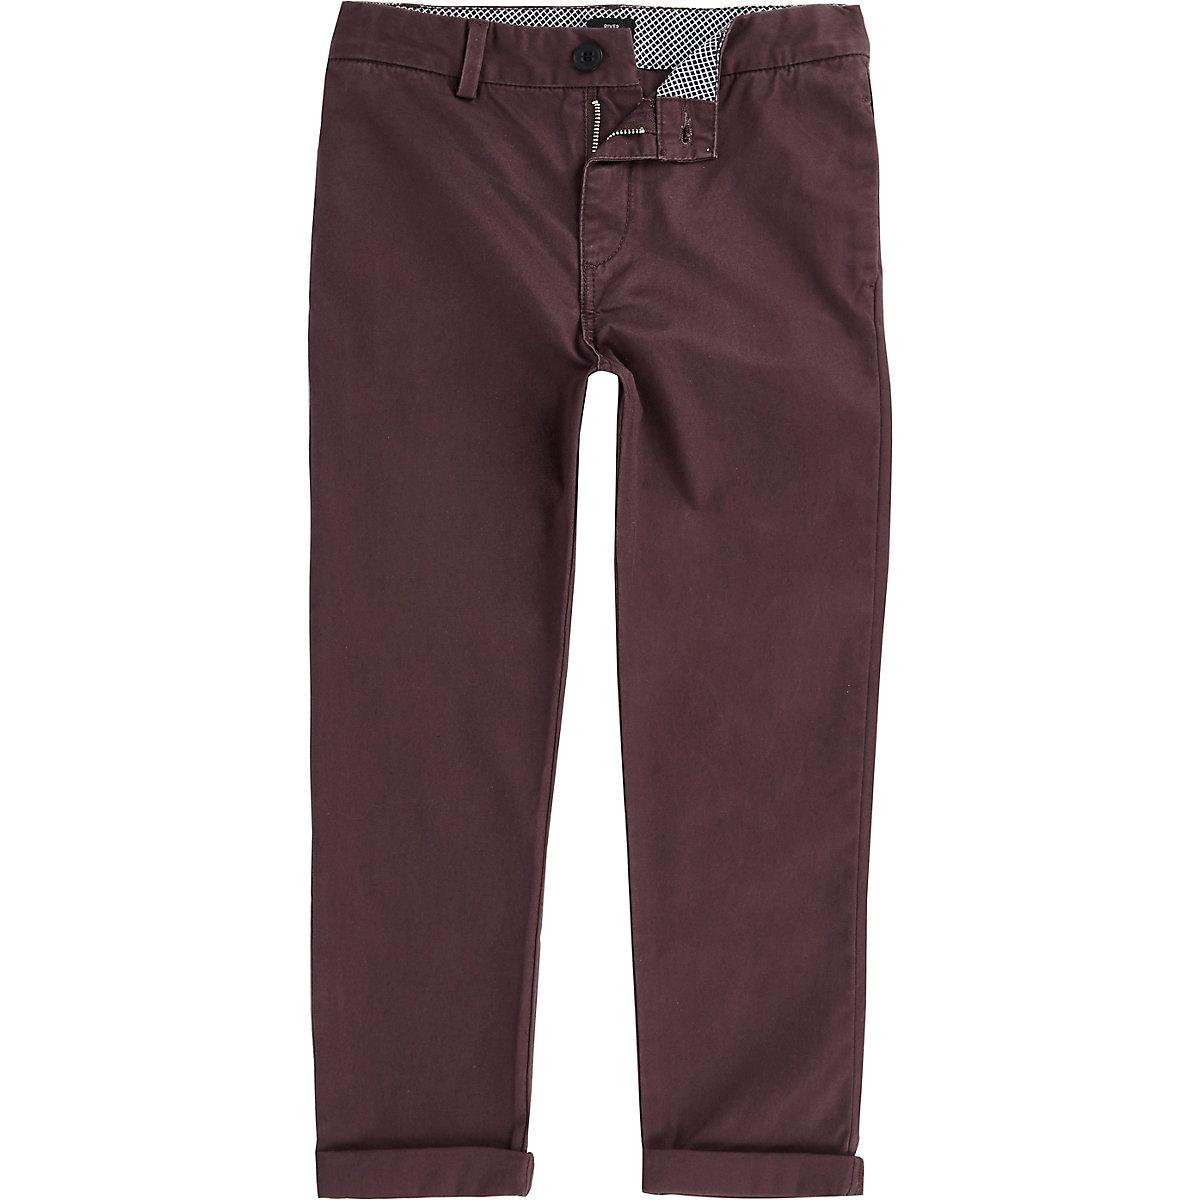 Boys burgundy chino pants